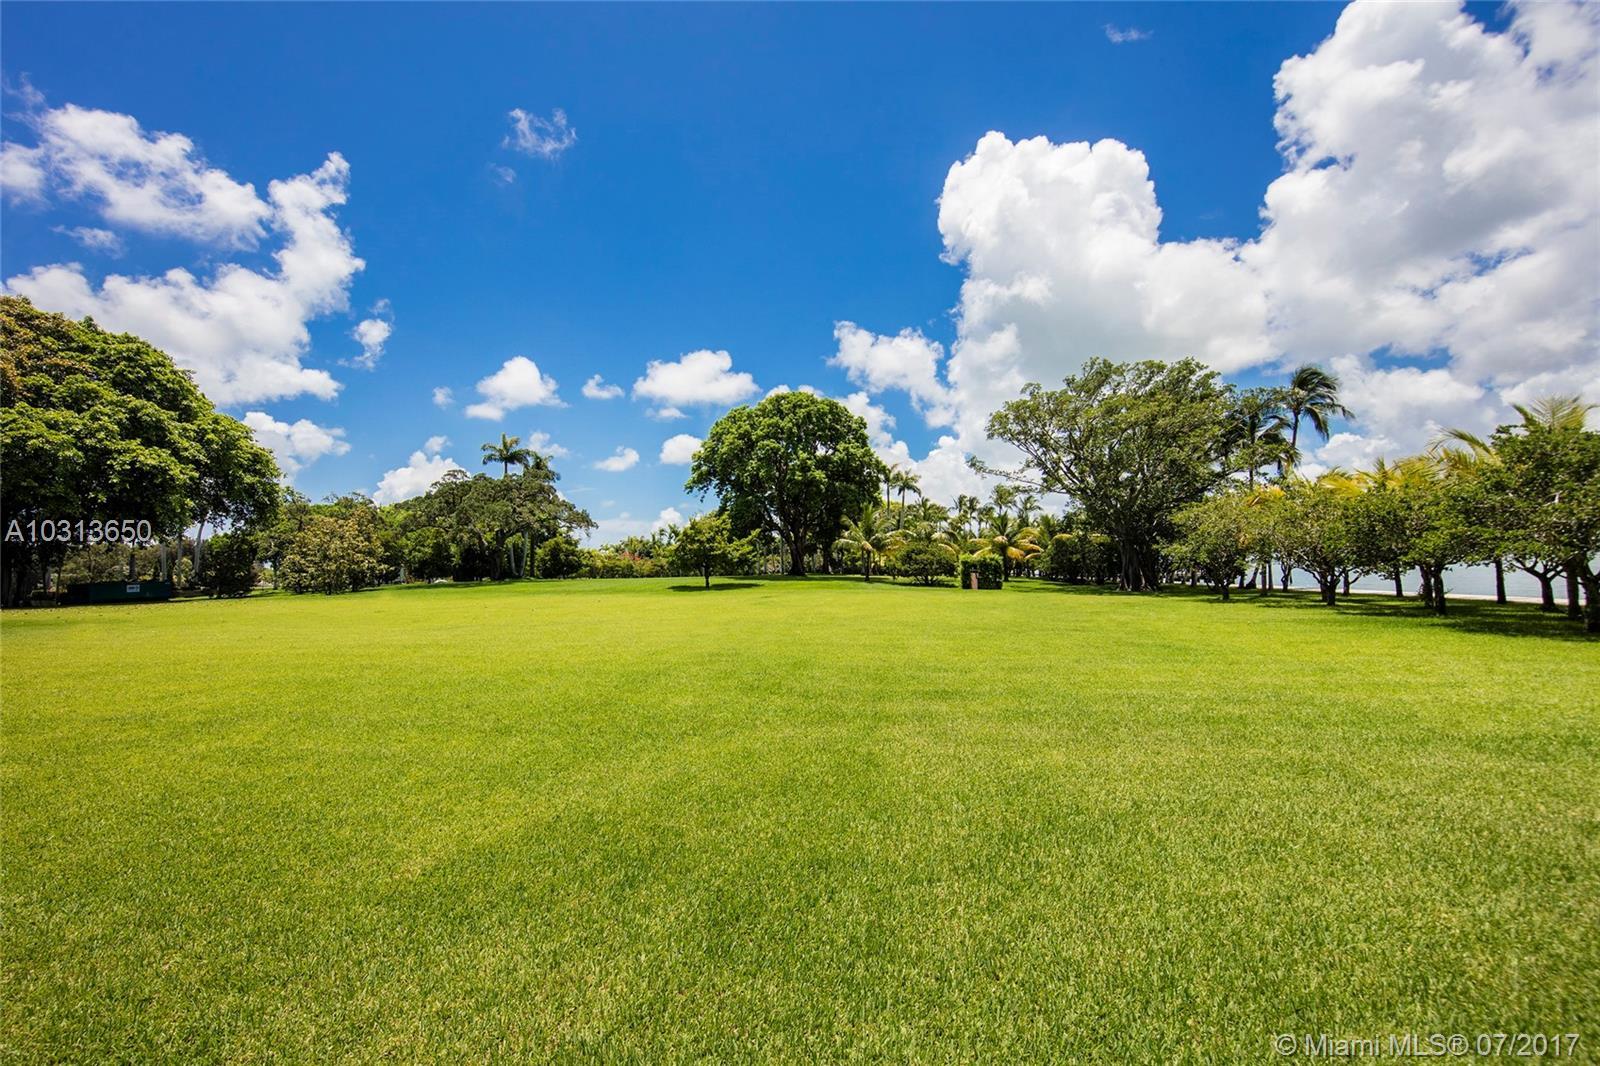 4-5-6-7 Indian Creek Island Rd, Indian Creek FL, 33154